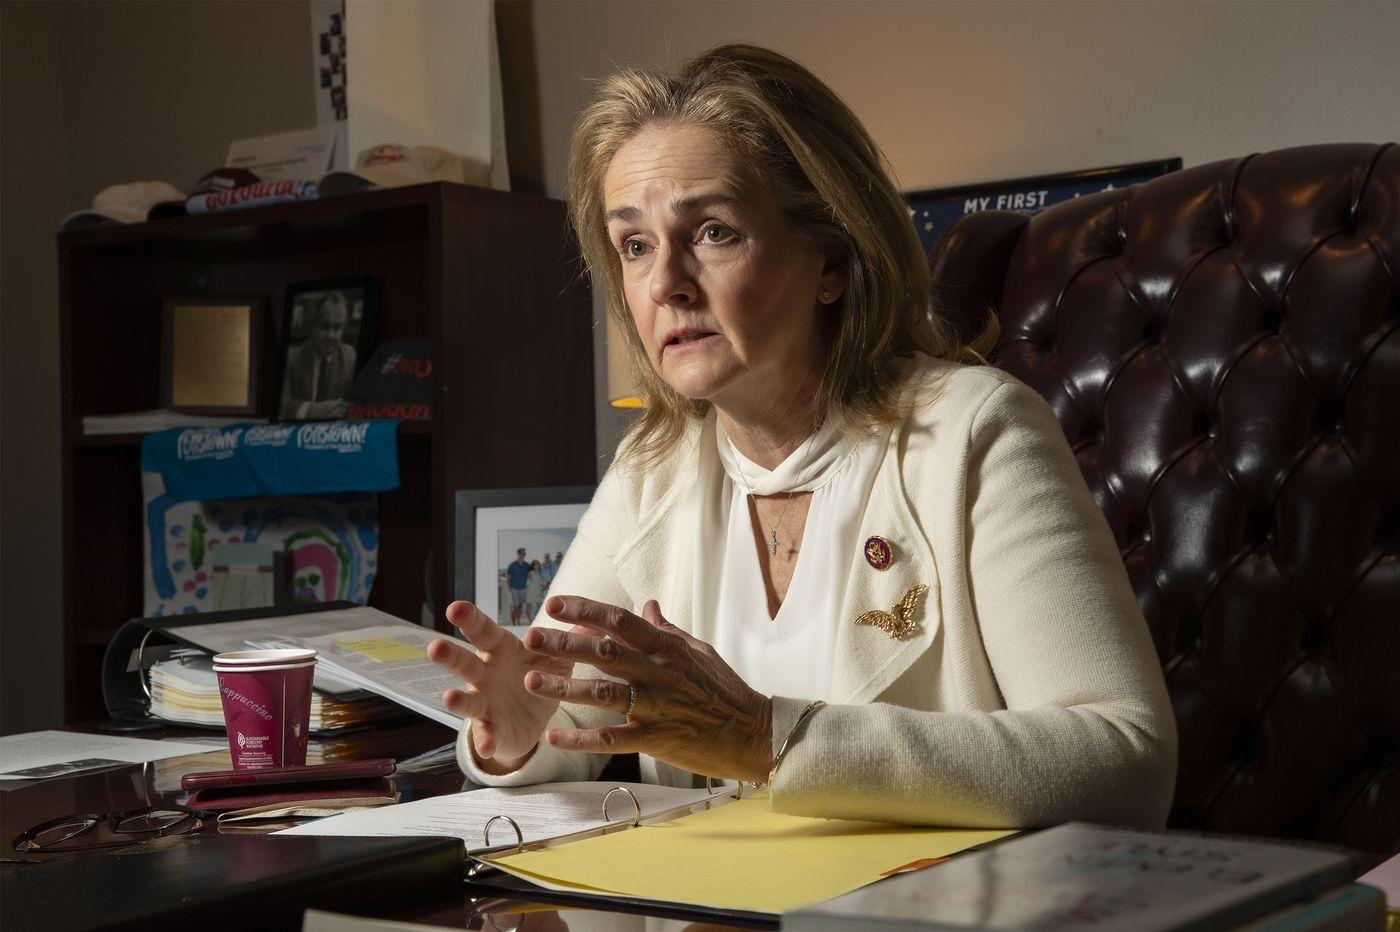 Another congresswoman from Pa. endorses Joe Biden for president